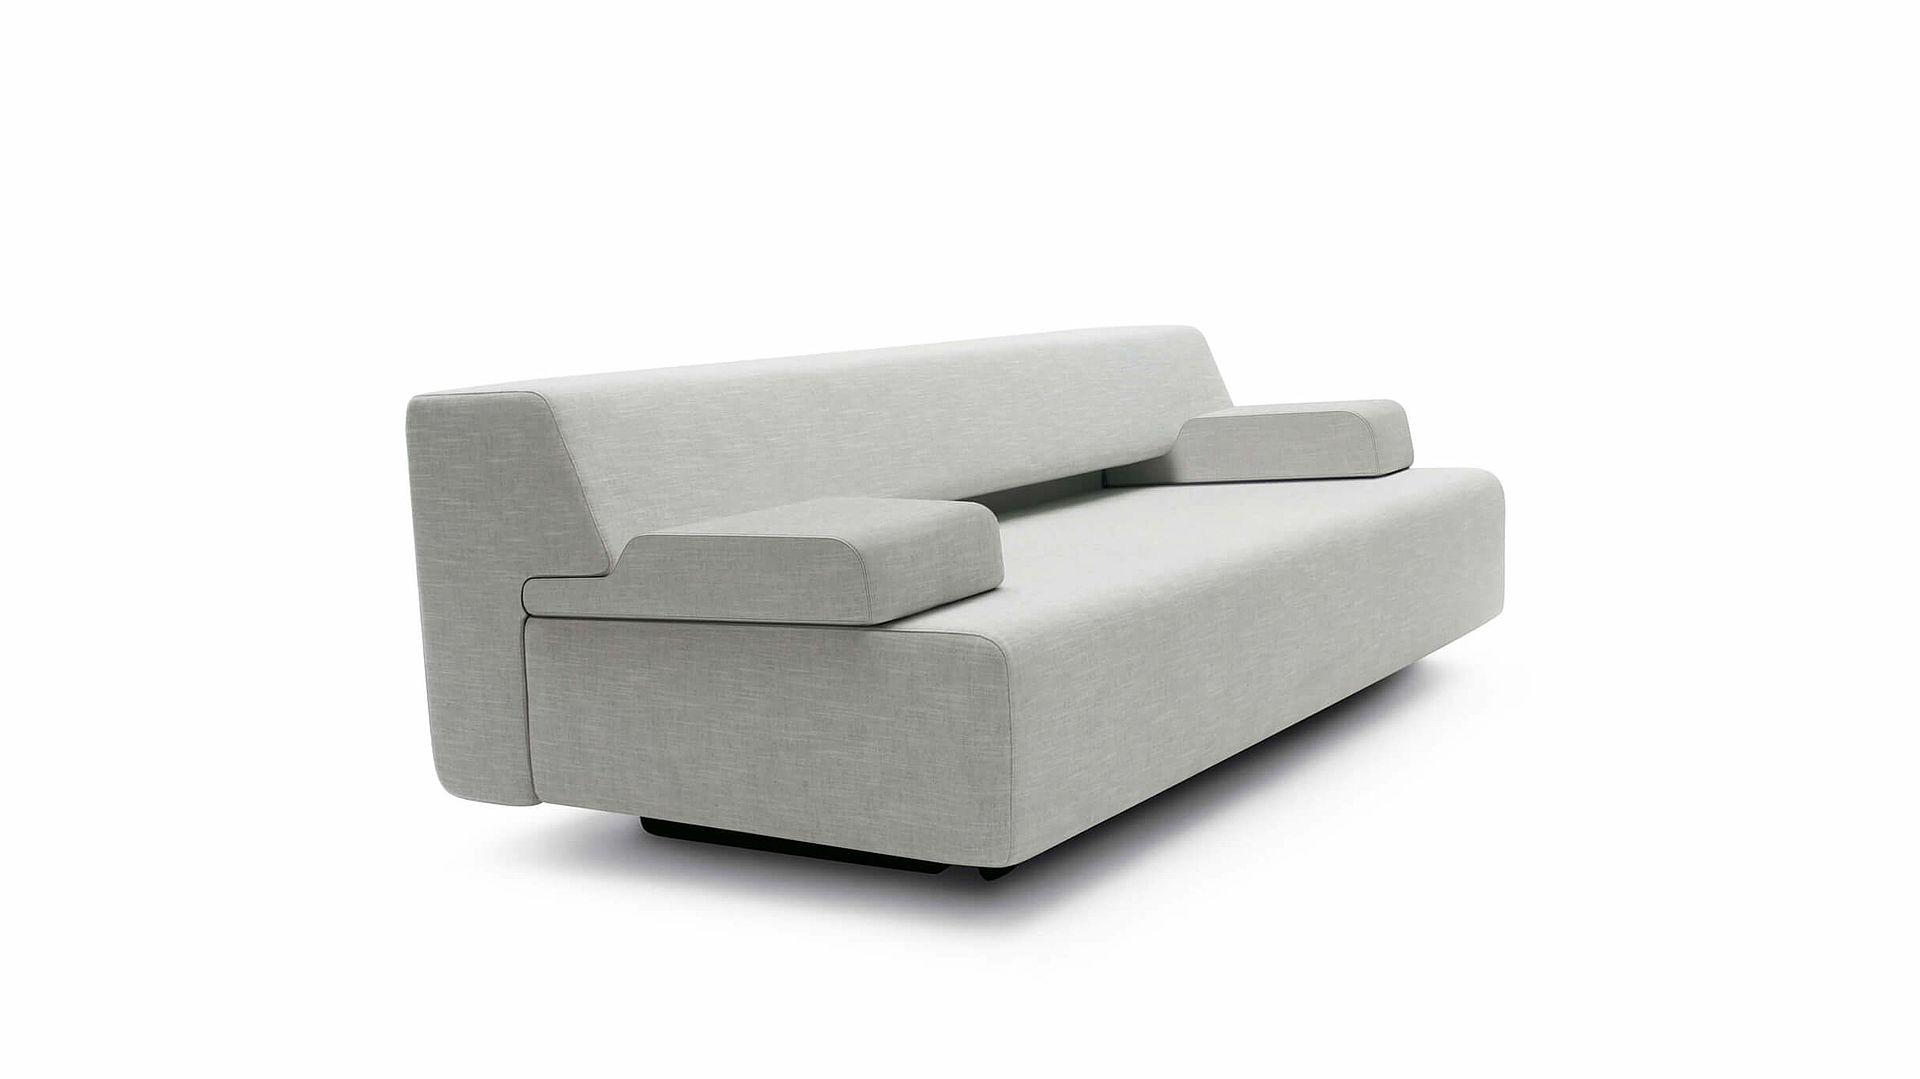 Cosma Sofa Bed Cor Home Ideas Sofa Sofa Bed Sleeping Couch